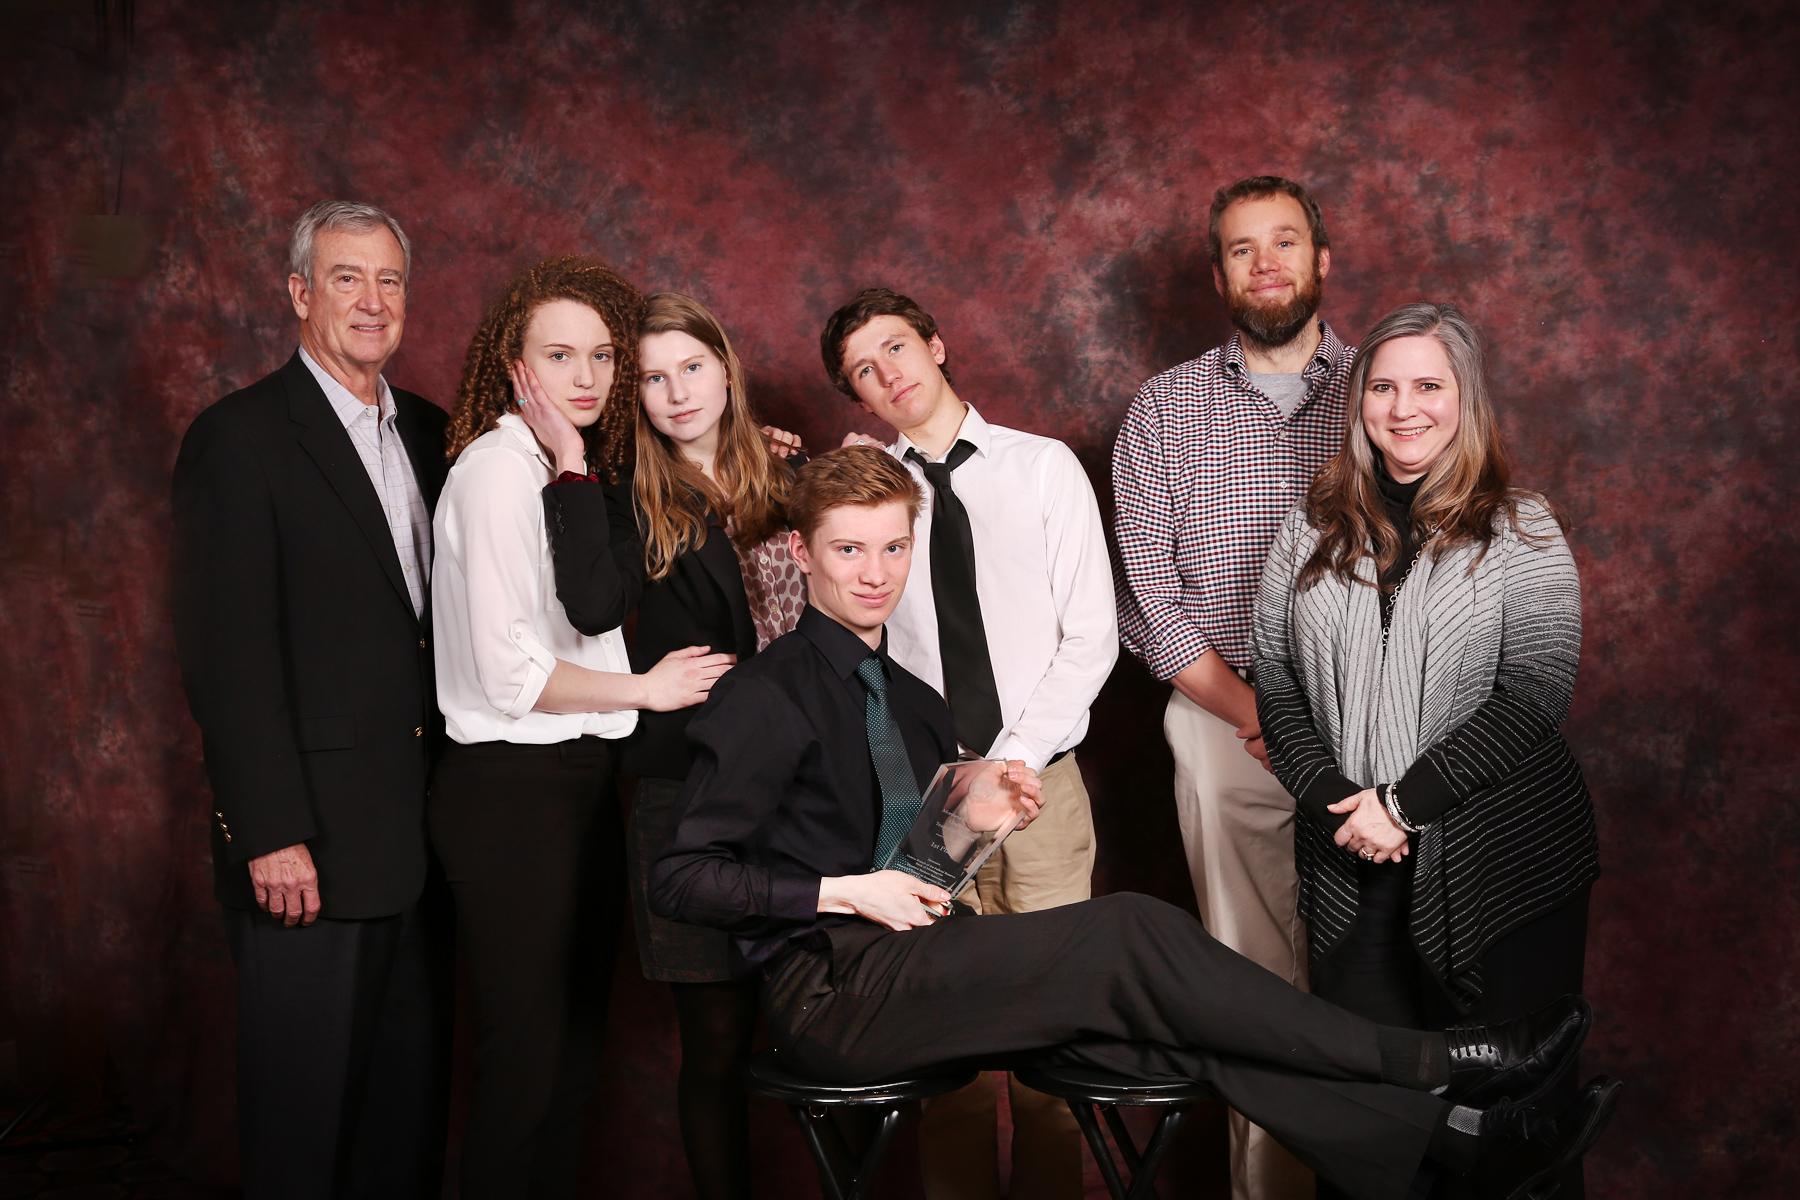 Bozeman High School -  Front Row (L-R)  Ben Holmgren Back Row (L-R)  Steve Turckiewicz (MBA), Camille Landon, Taylor Jones, Wes Robbins, Dave Budt (Teacher), Rhonda Krieger (FRB)